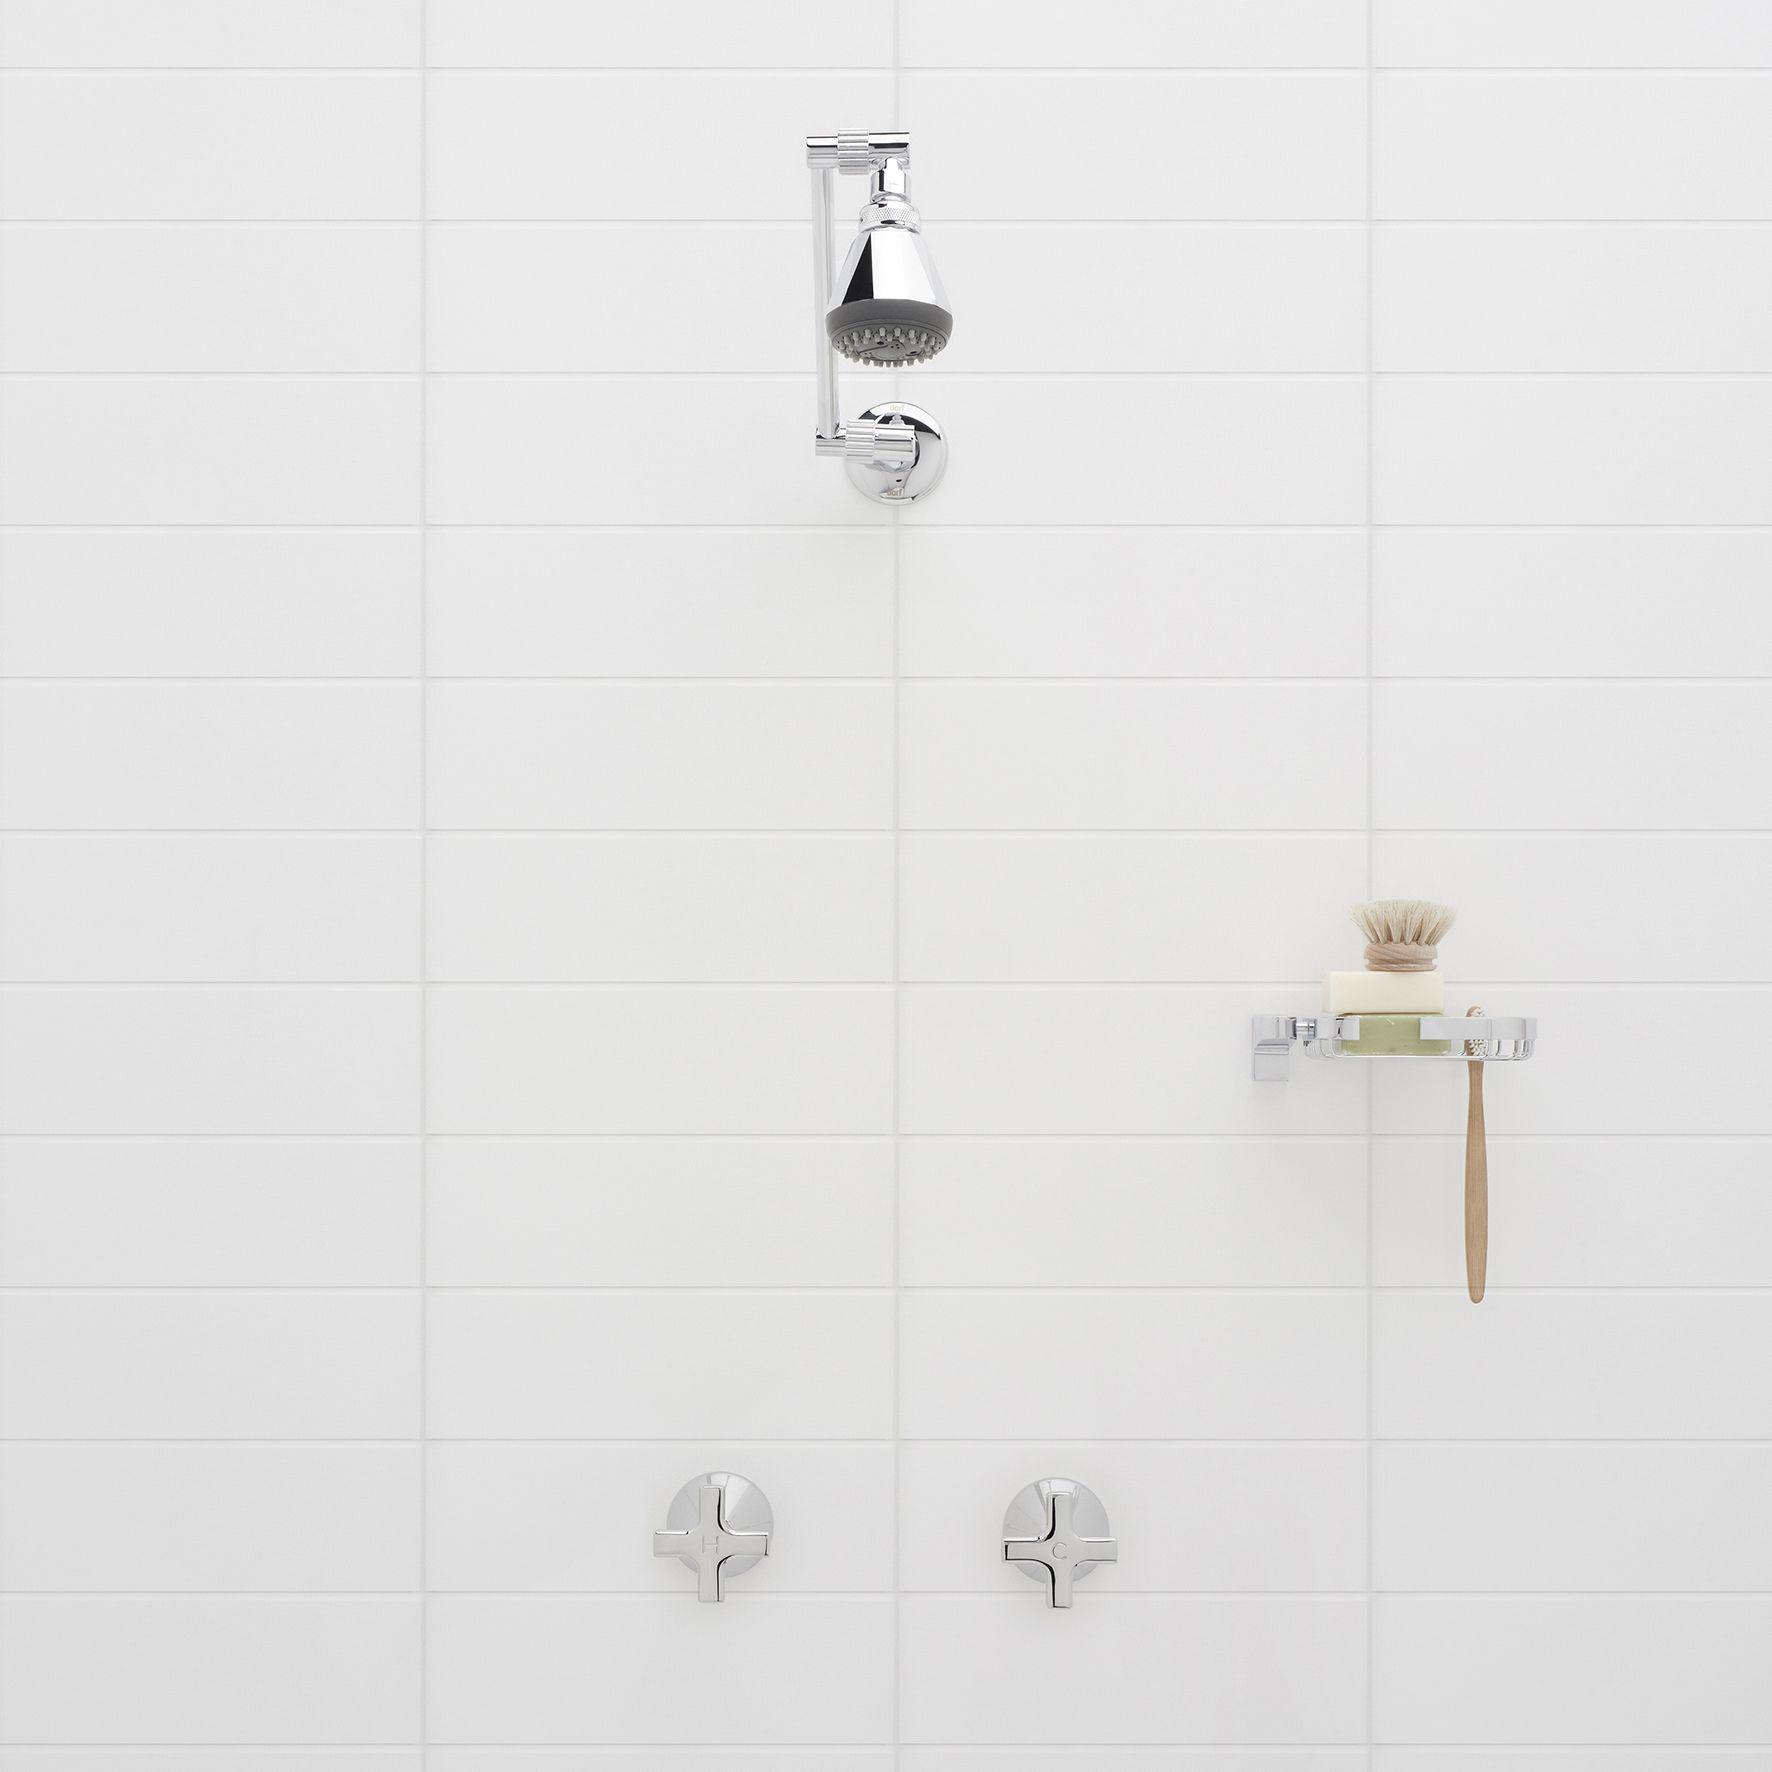 Dorf Maxum Adjustable Wall Shower Set #dorf #dorfstyle #tap ...